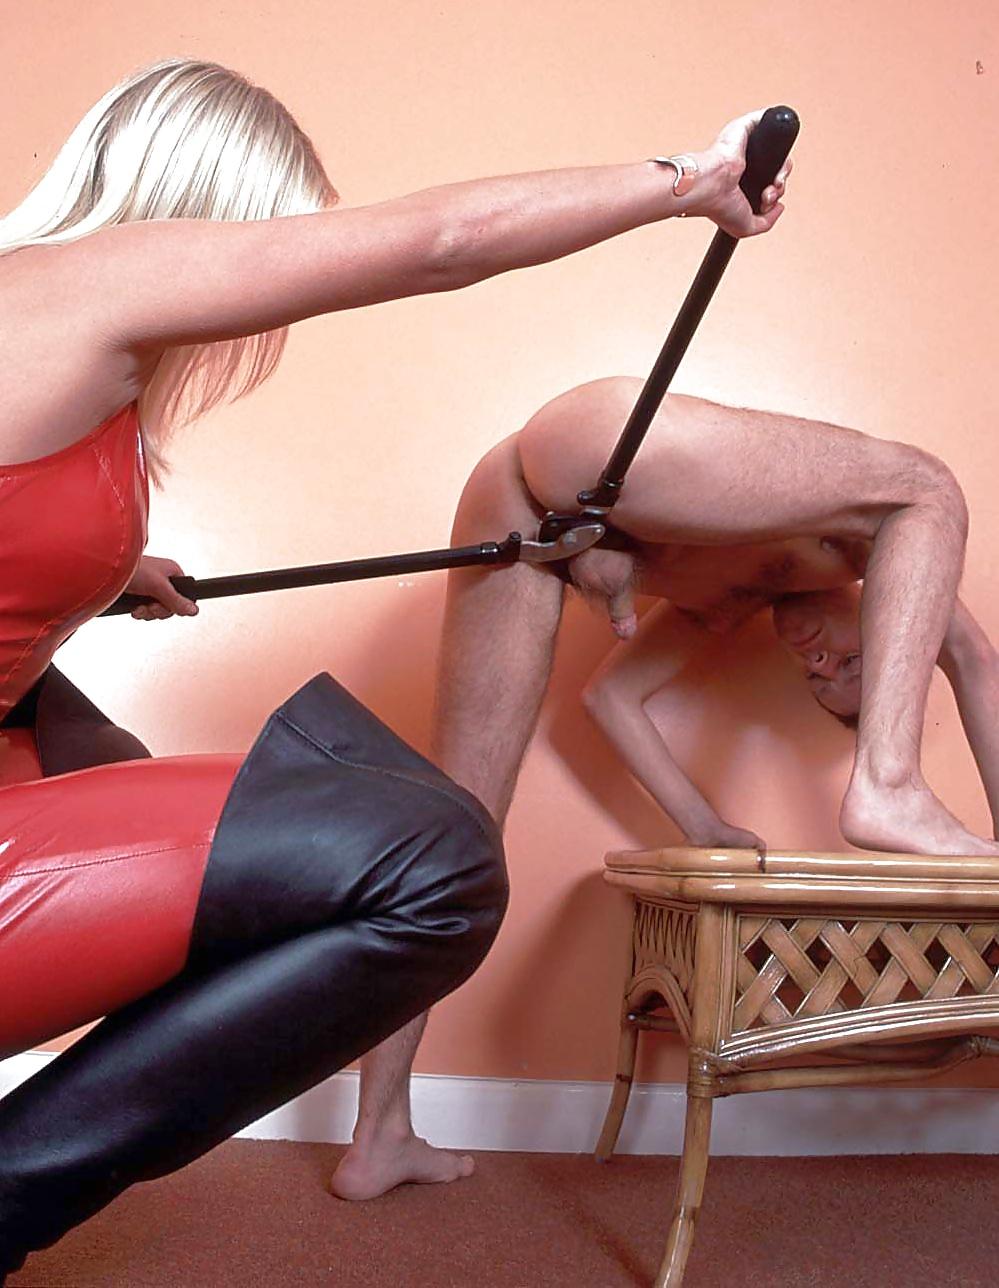 госпожа наказывает раба клизмой - 8